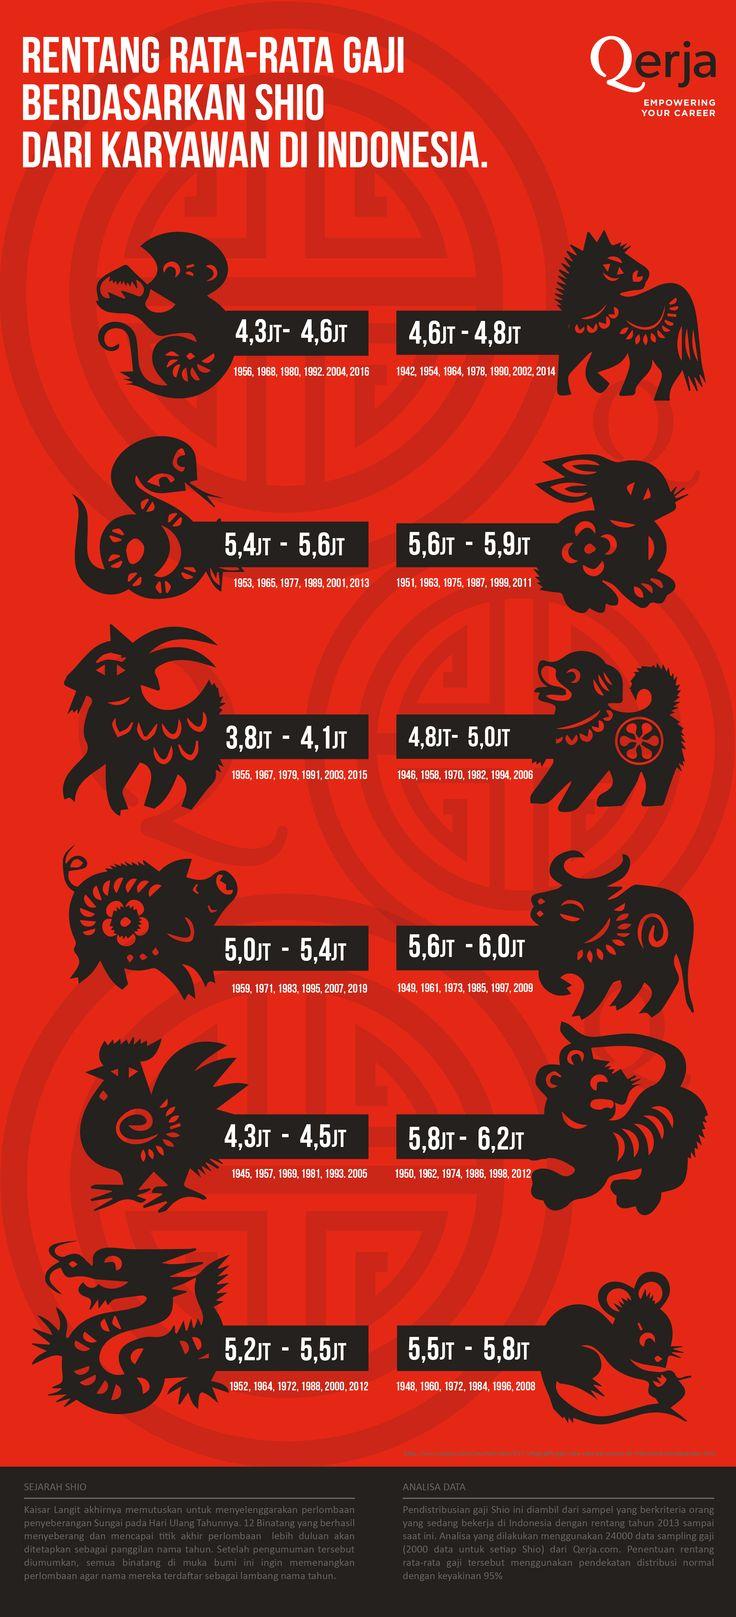 #infographic #infografik #shio #gaji #indonesia #ratarata #average #qerja